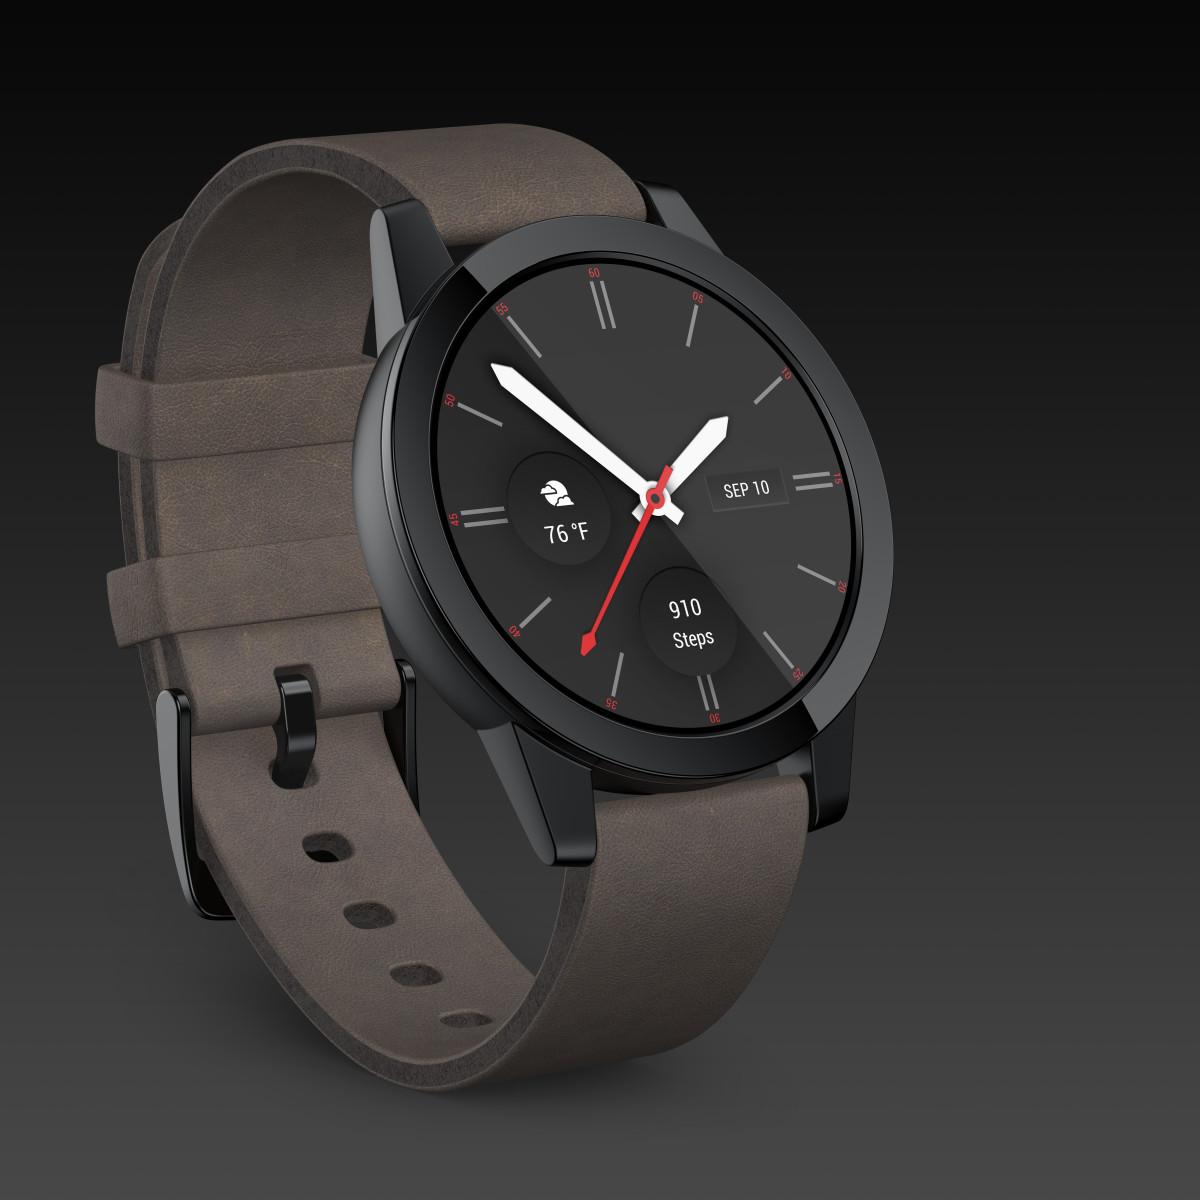 Qualcomm announce new Snapdragon Wear 3100 smartwatch ...